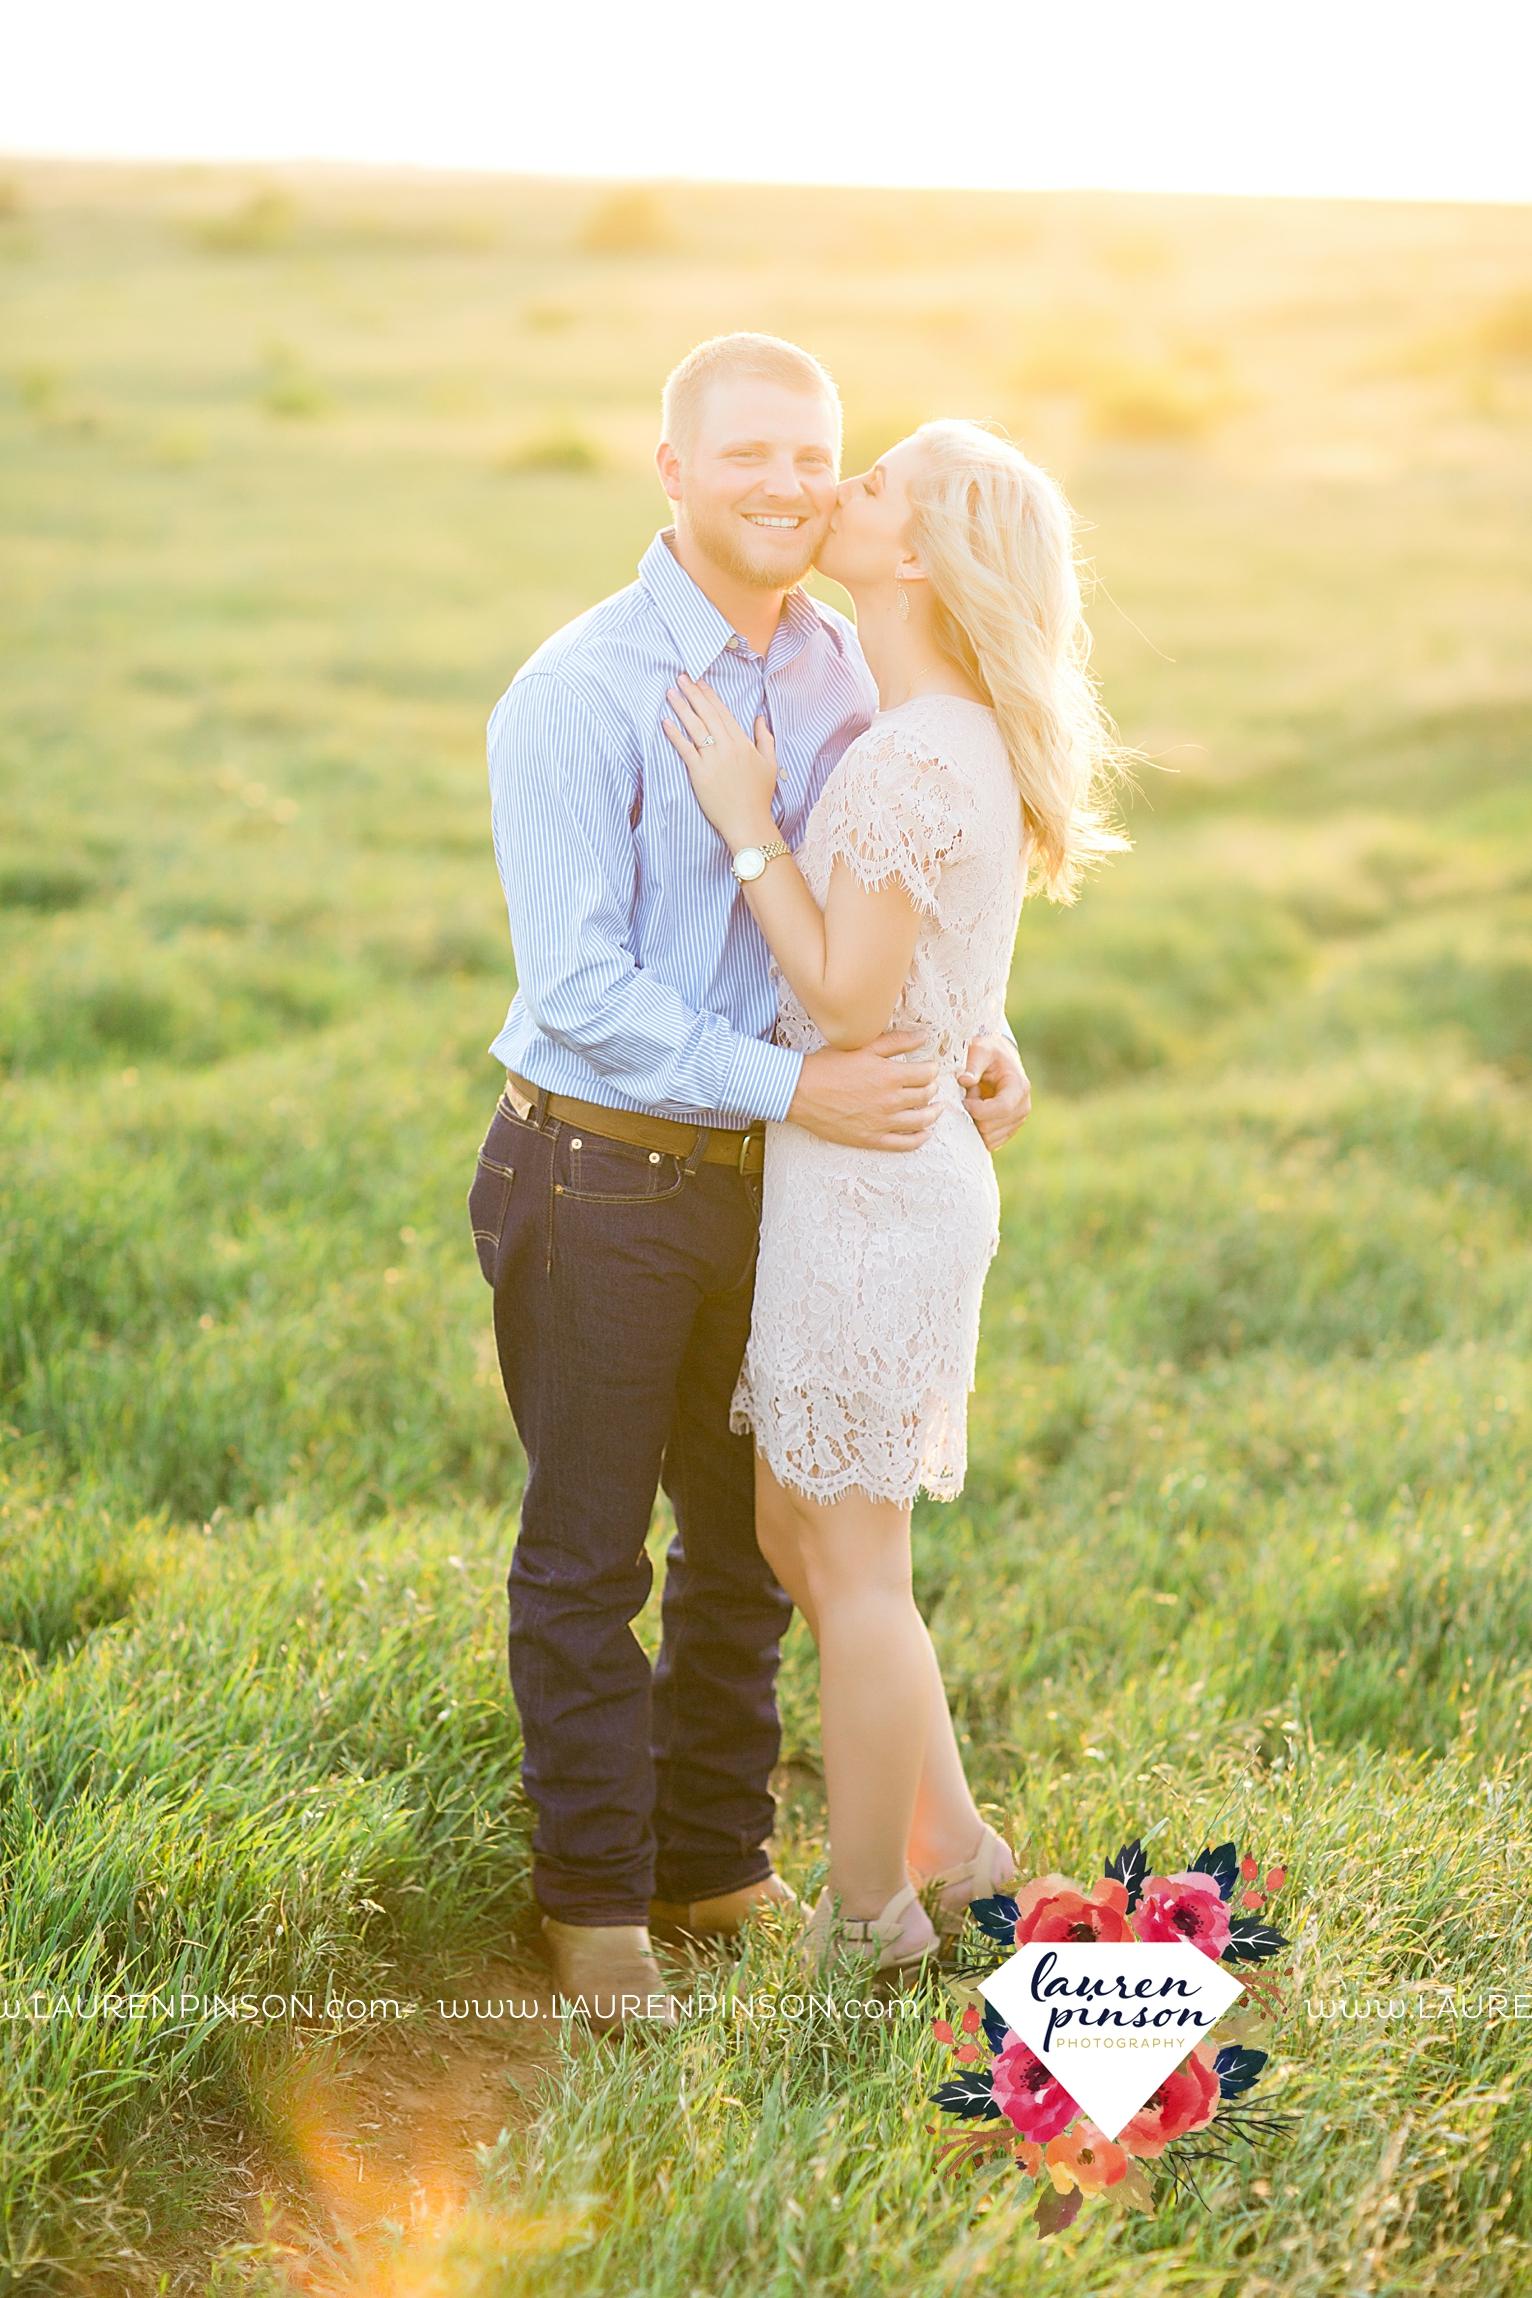 wichita-falls-texas-wedding-photographer-scotland-texas-engagement-session-country-barn-field-windthorst_2759.jpg